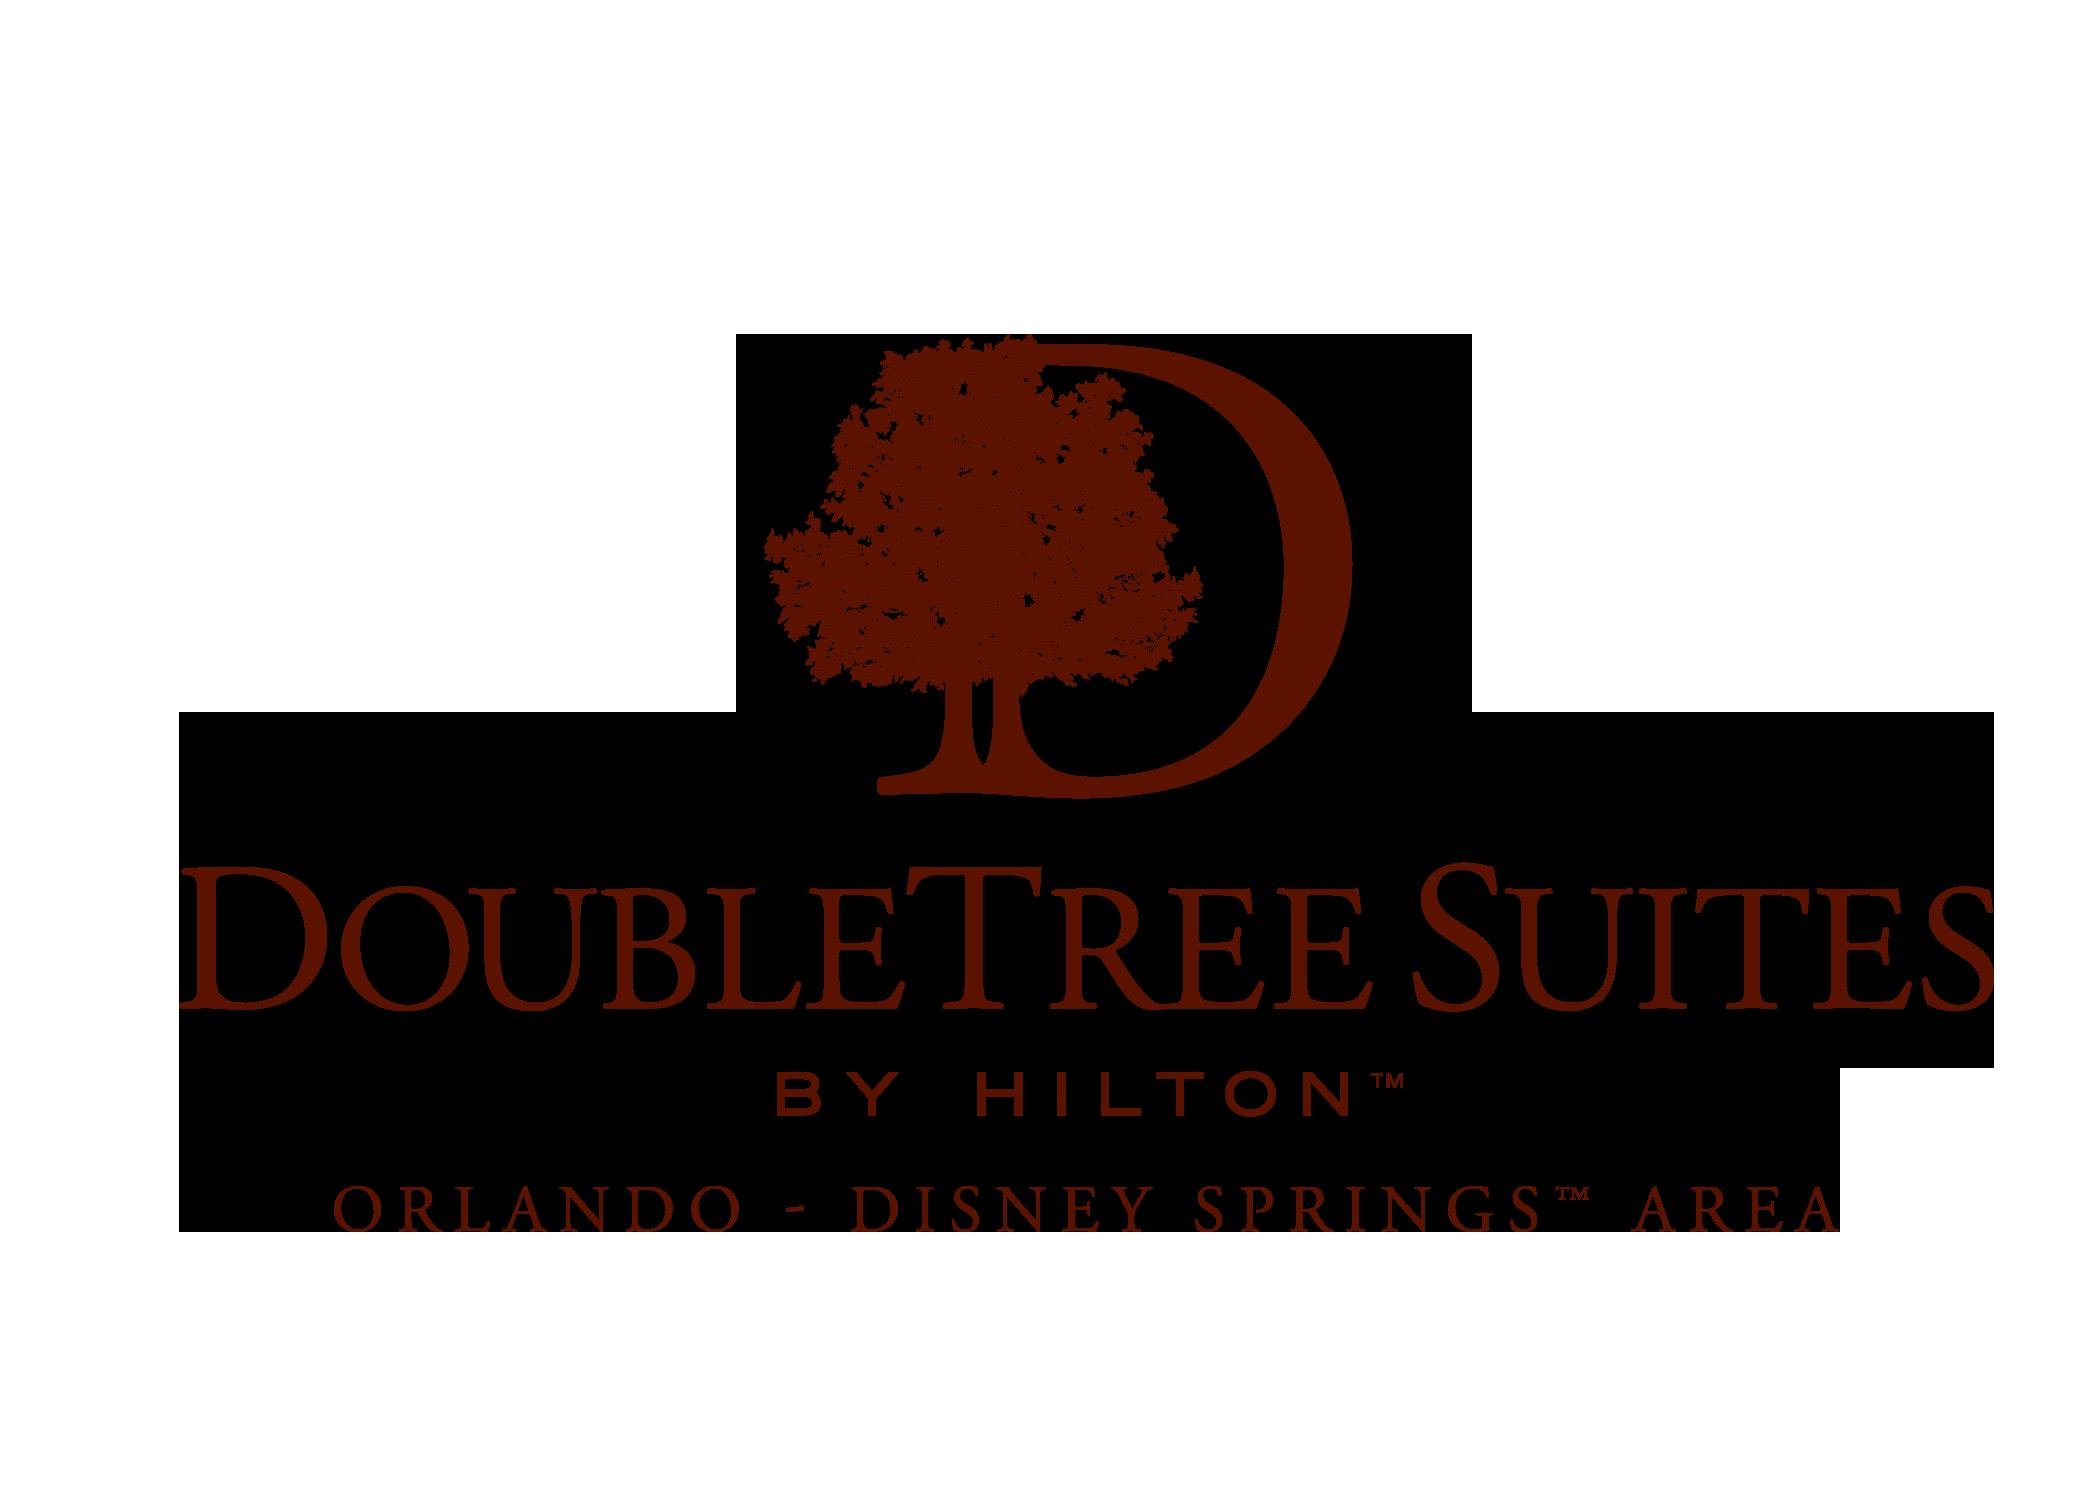 DoubleTree Suites by Hilton Orlando-Disney Springs logo